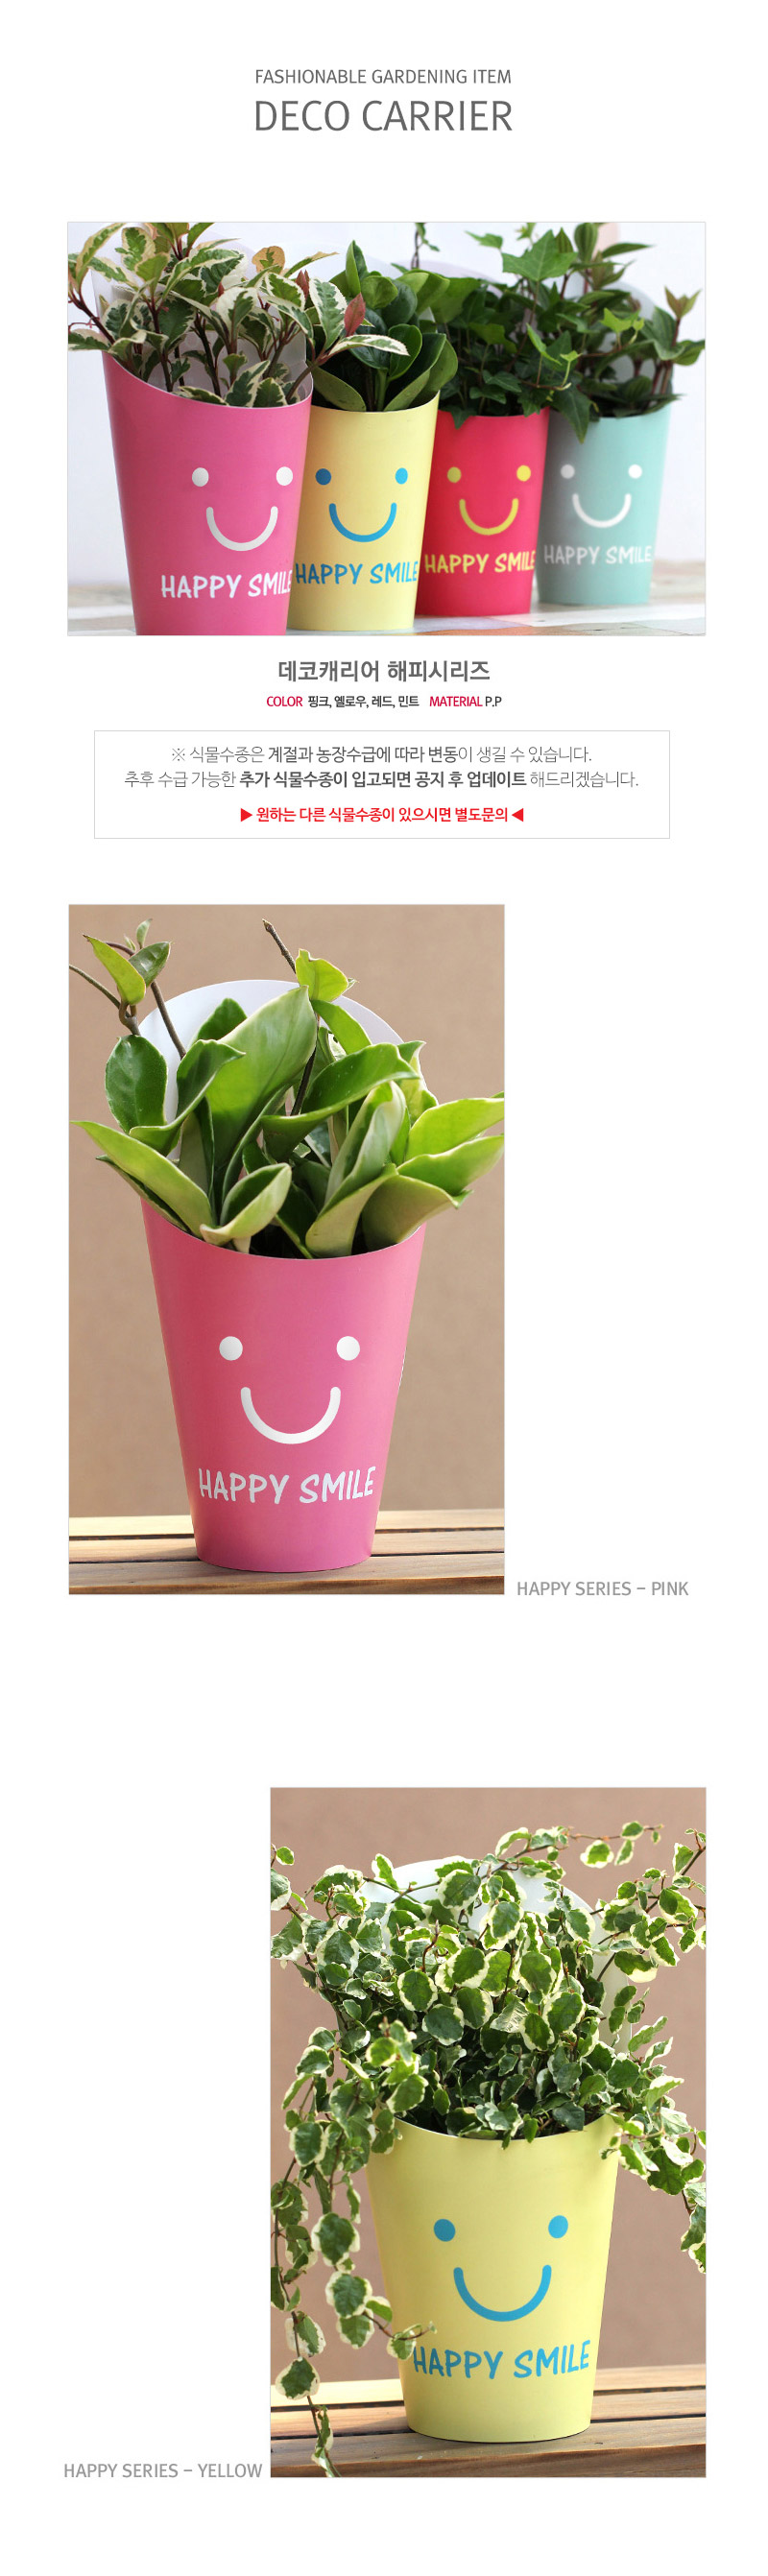 happy_smile_01.jpg